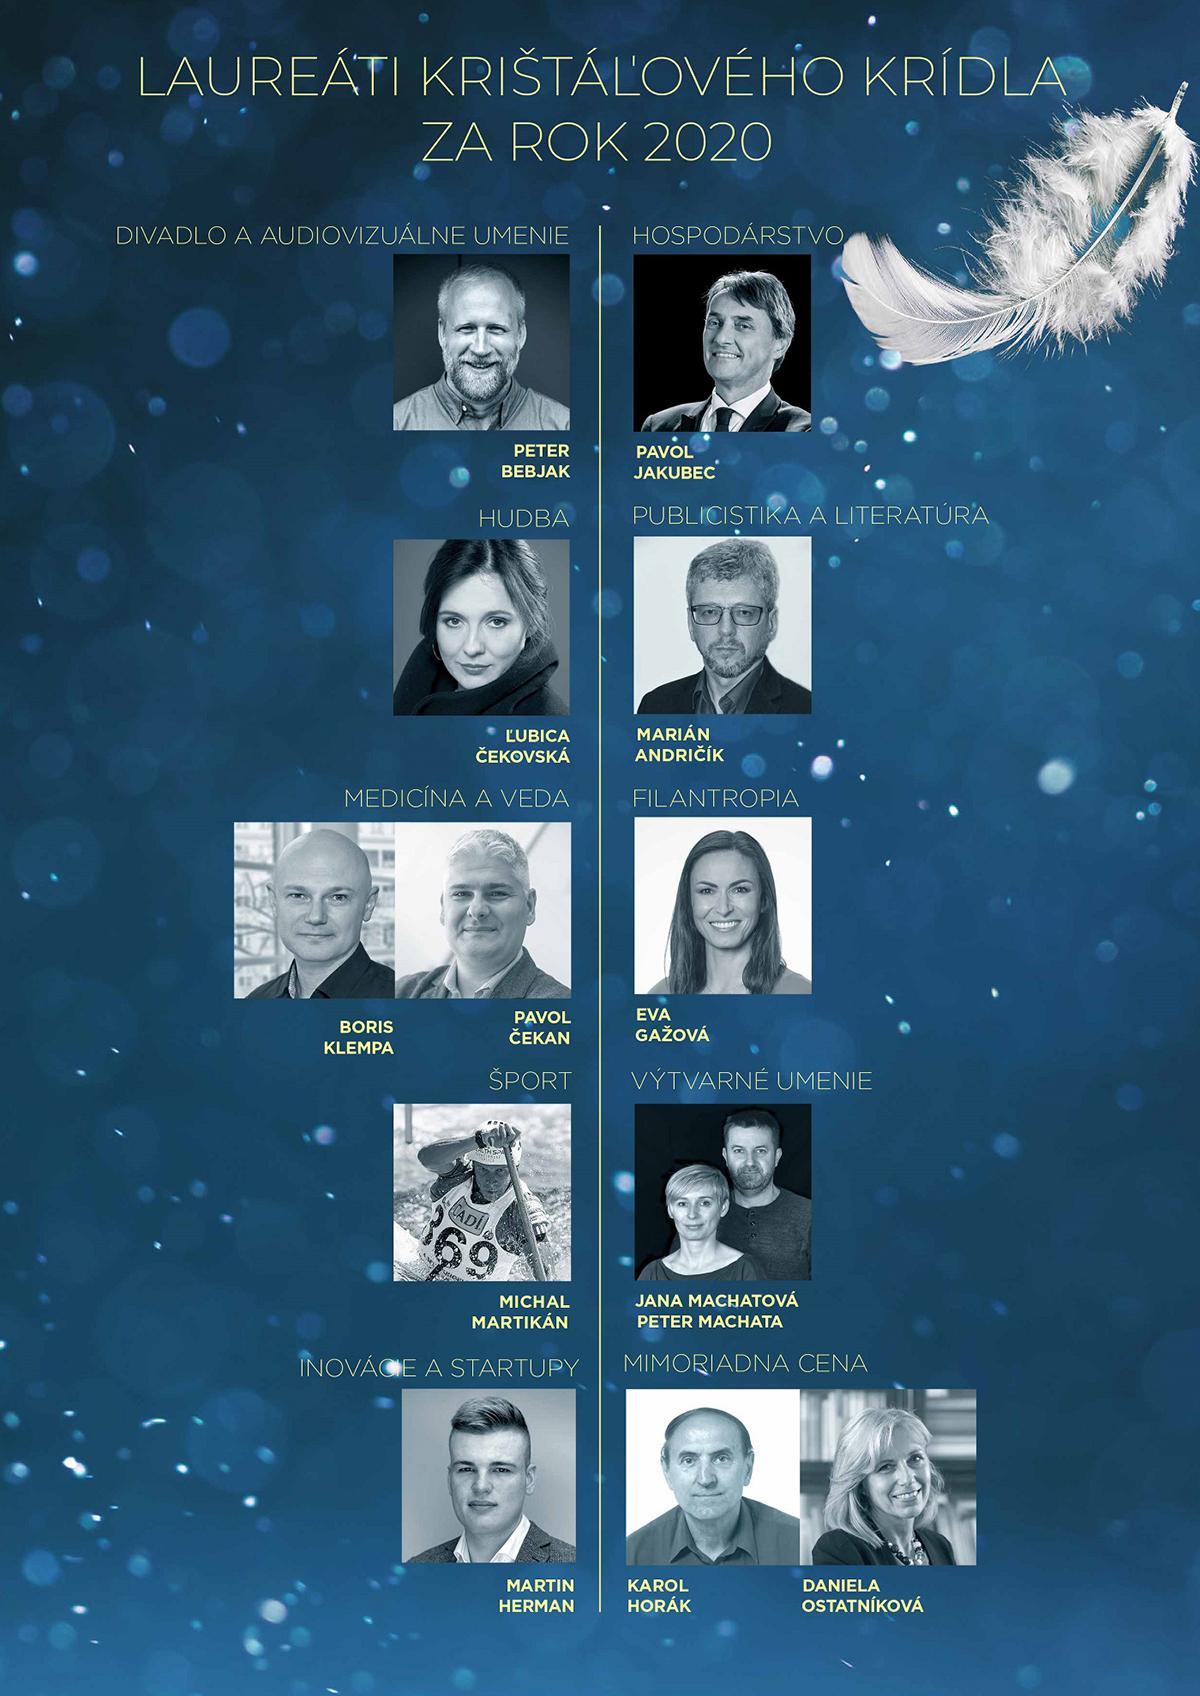 laureati kristalove kridlo za rok 2020